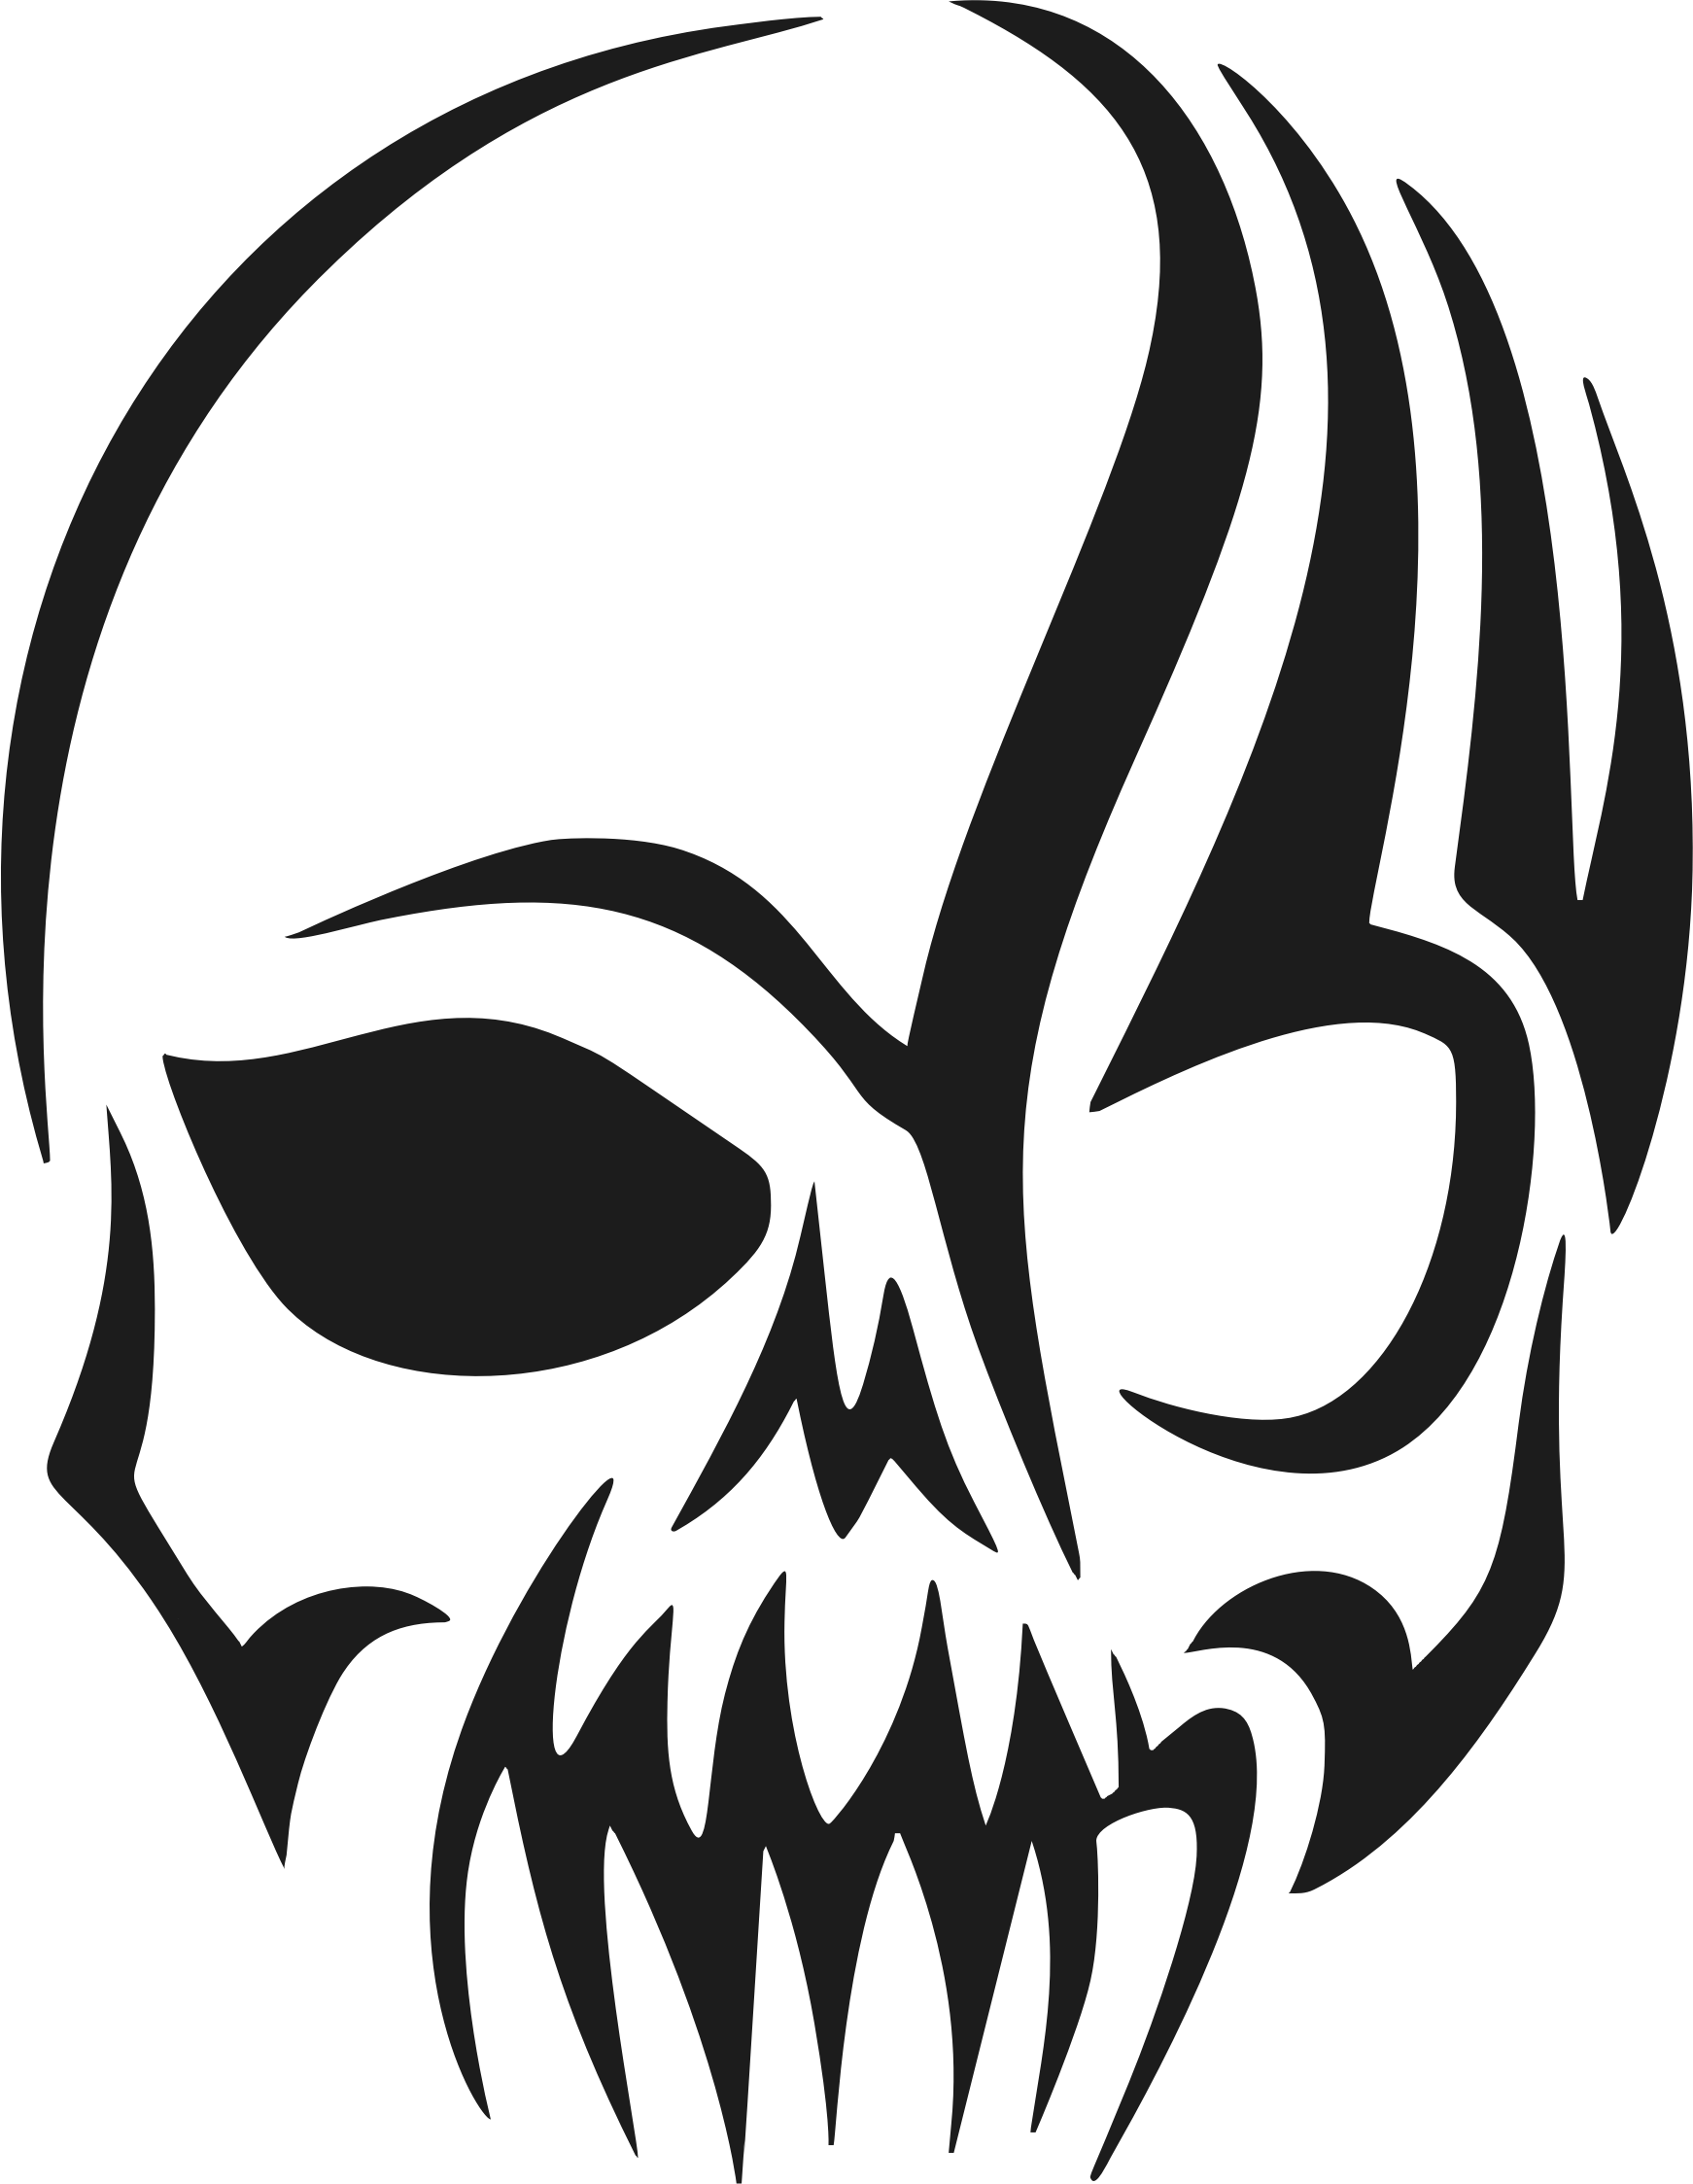 Silhouette clip art at. Longhorn clipart sugar skull